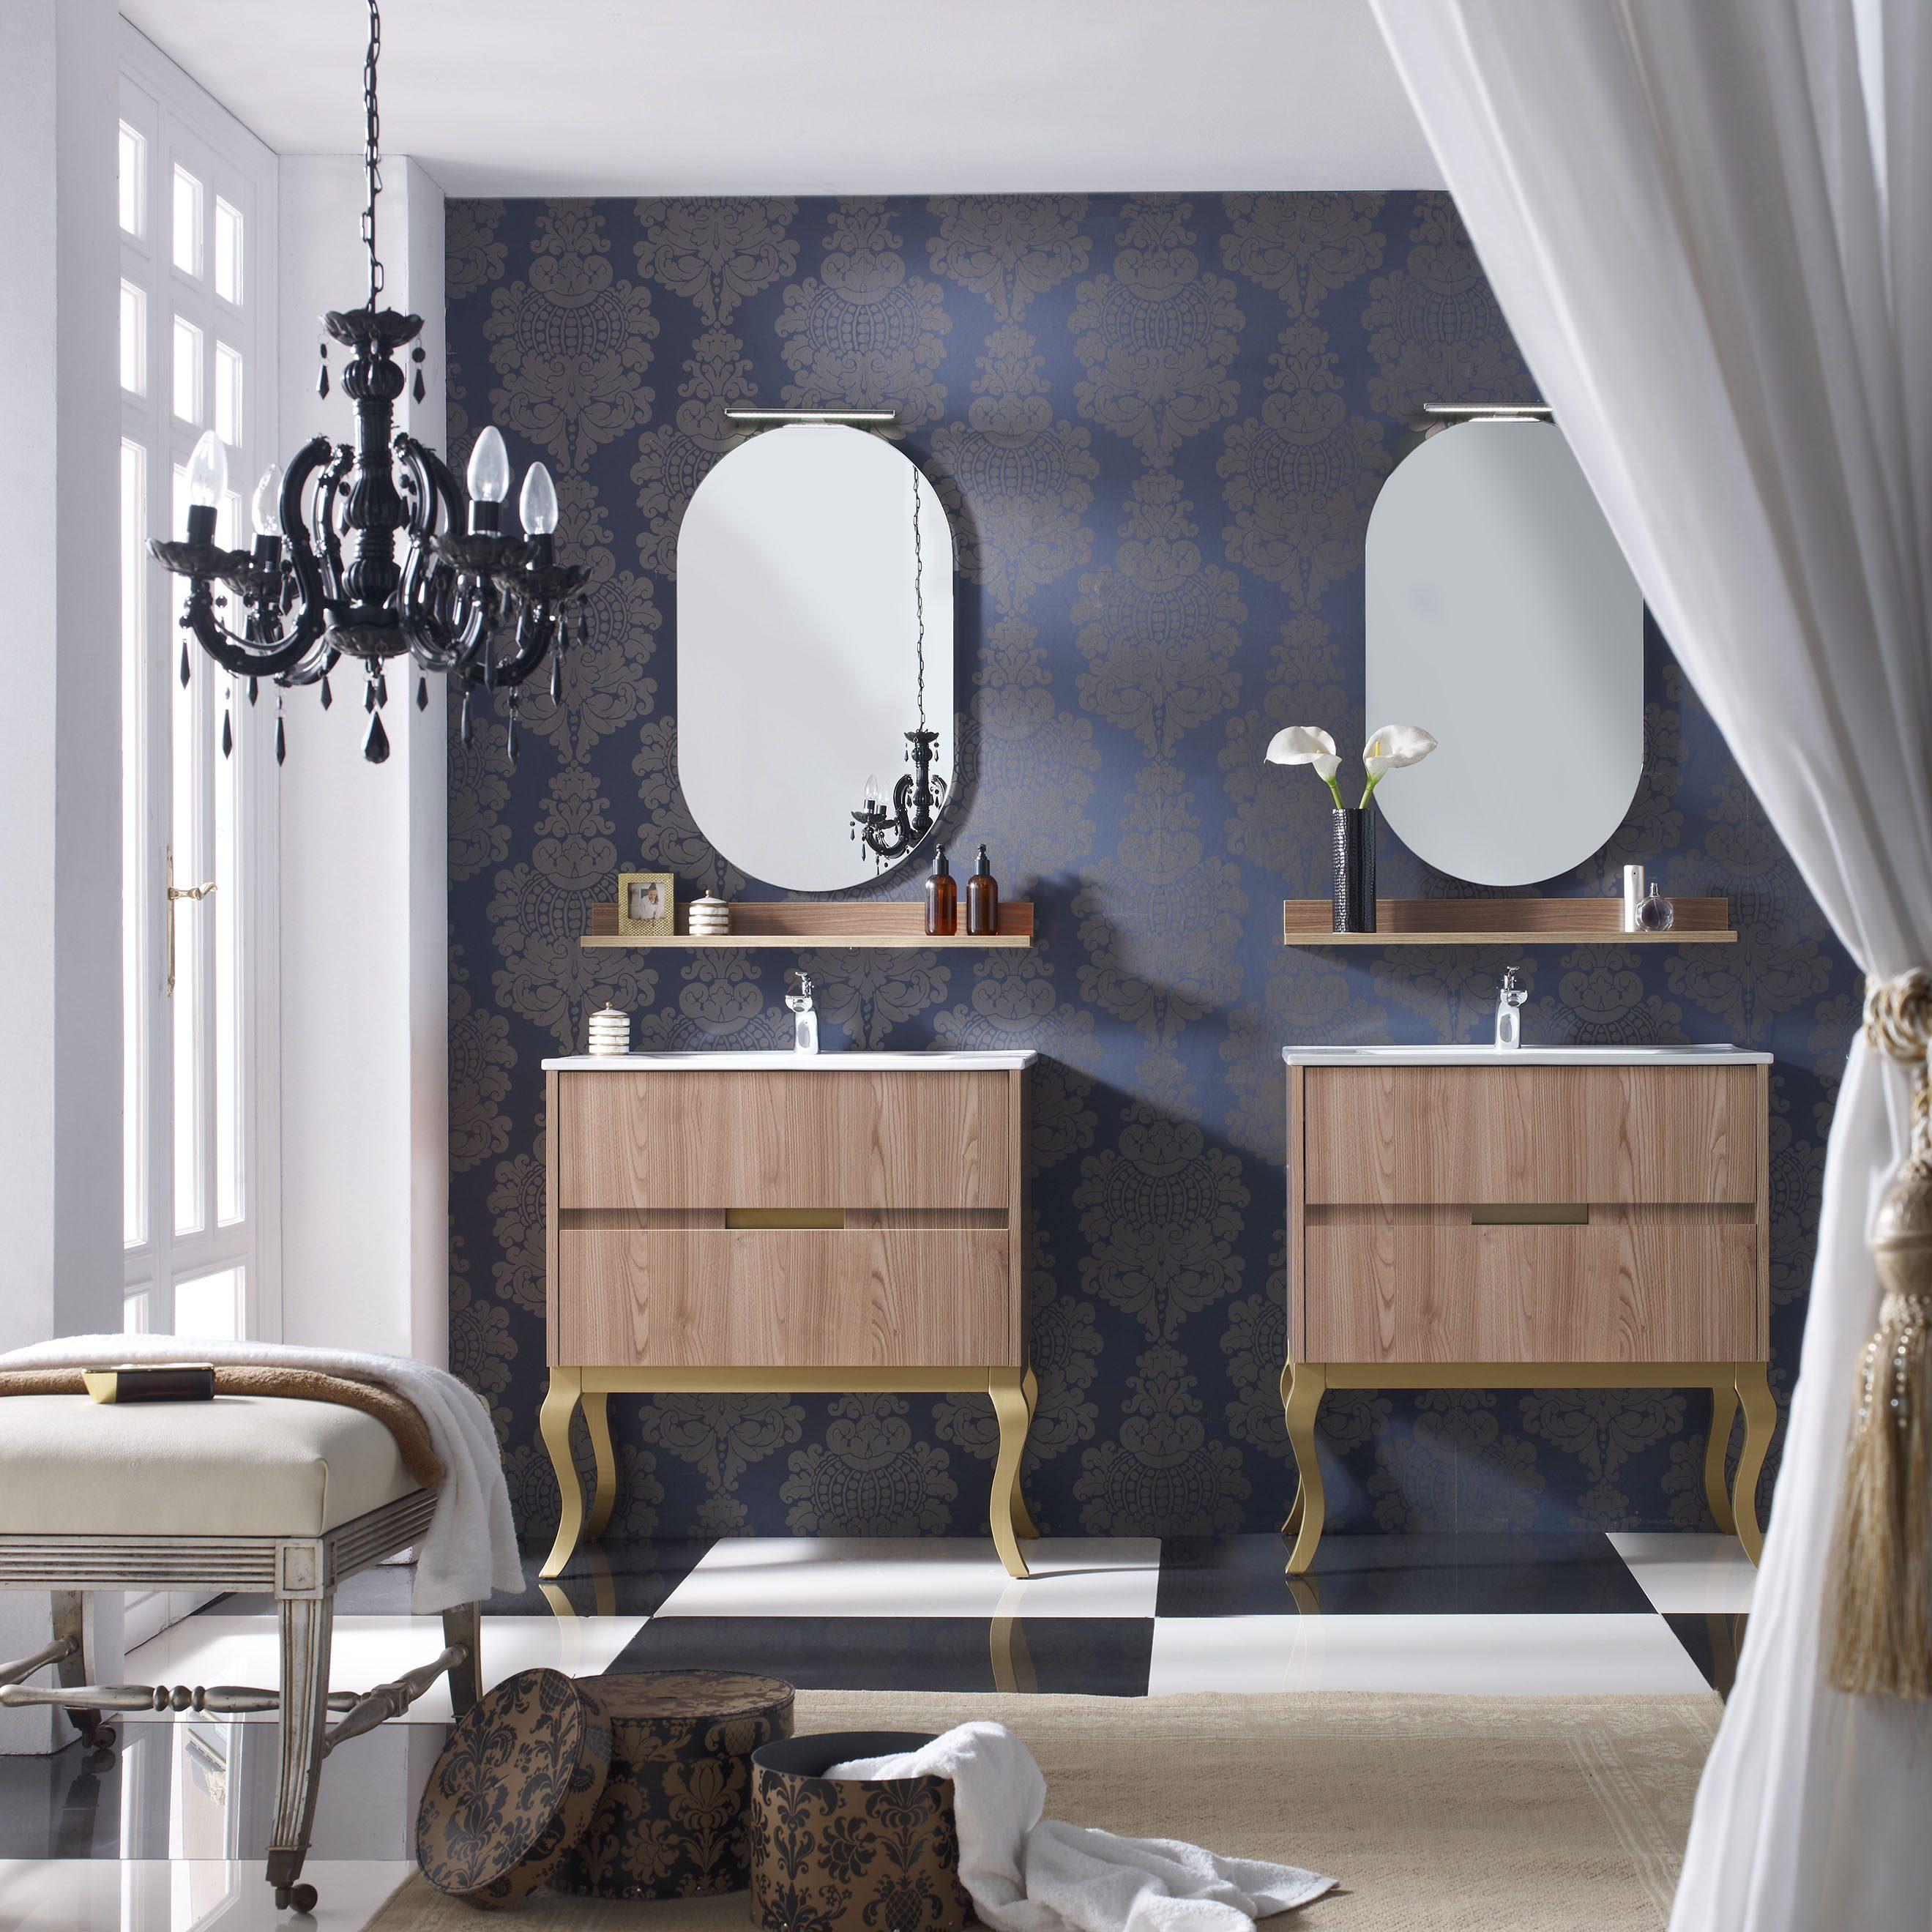 Diseño cuarto de baño Imagal